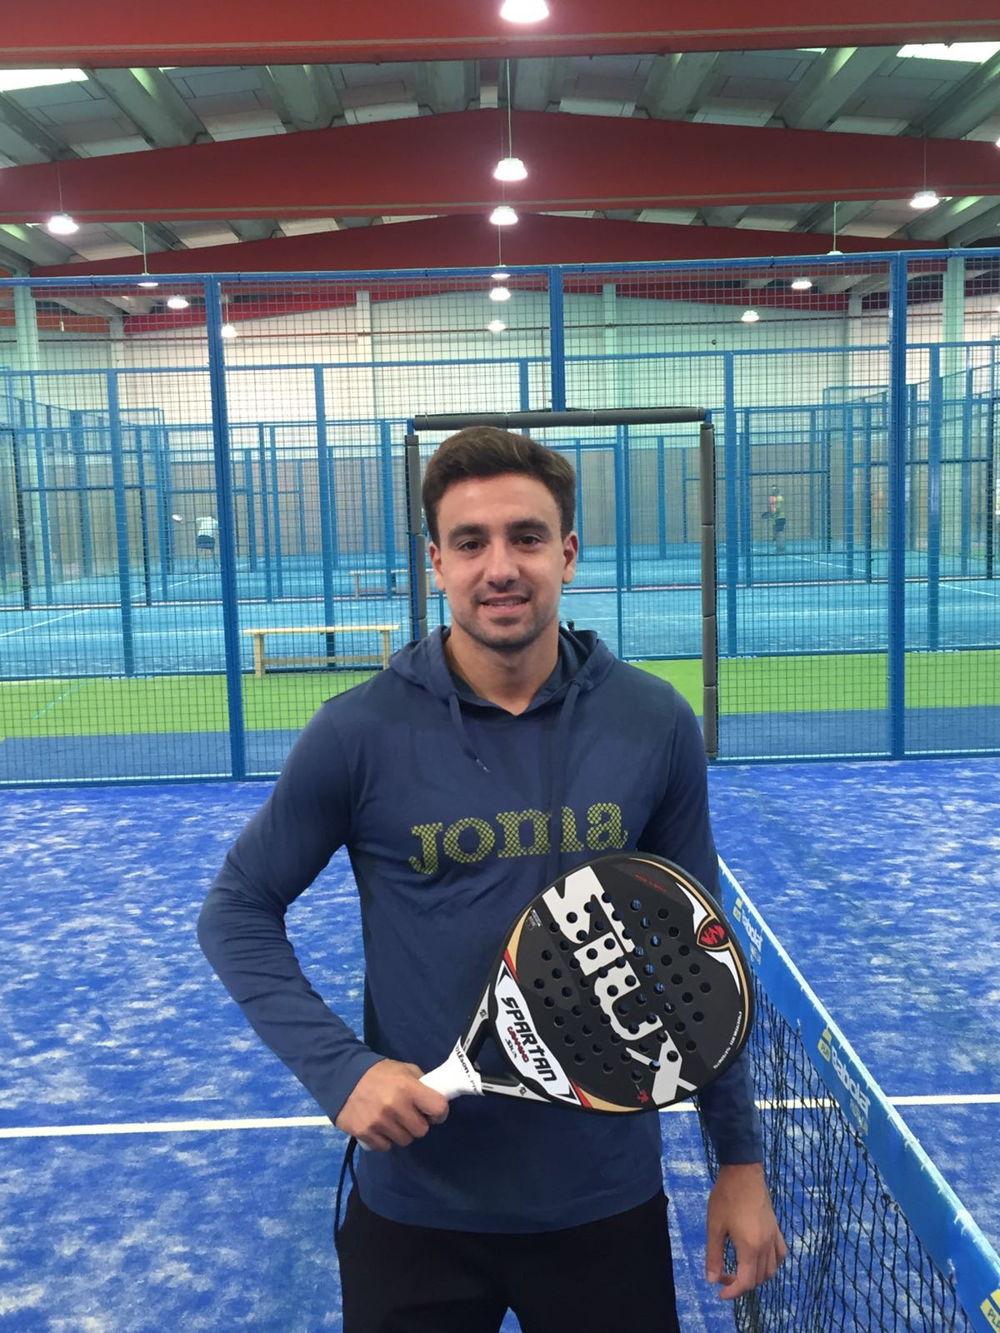 Aris Patiniotis Aris Pationitis, nuevo jugador Siux Padel